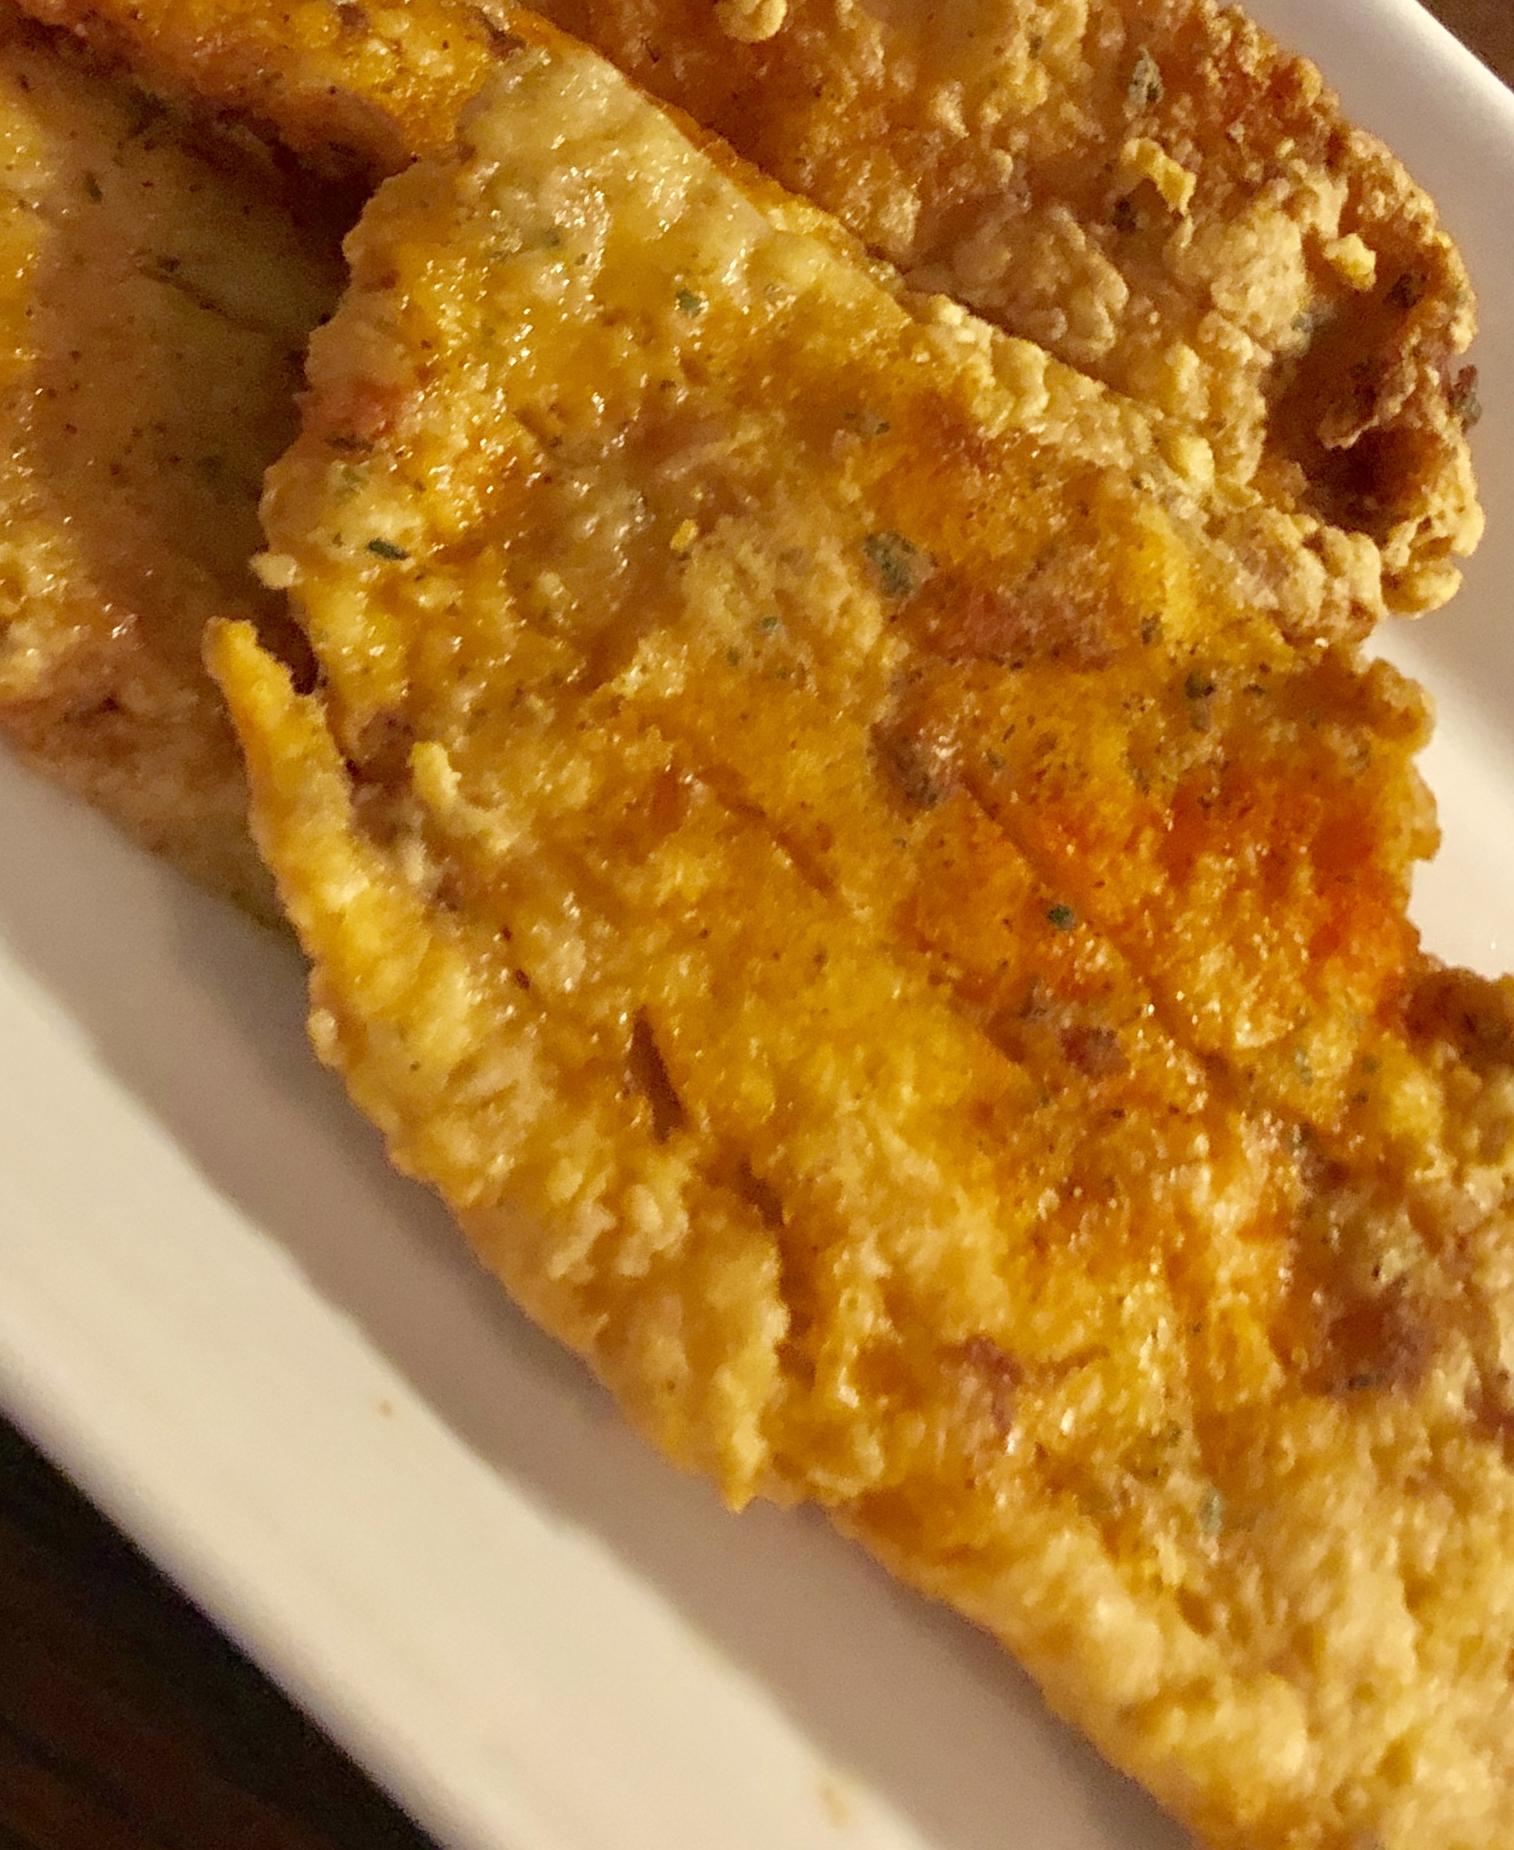 Suzy's Swai Meuniere (Swai in Lemon Butter Sauce)